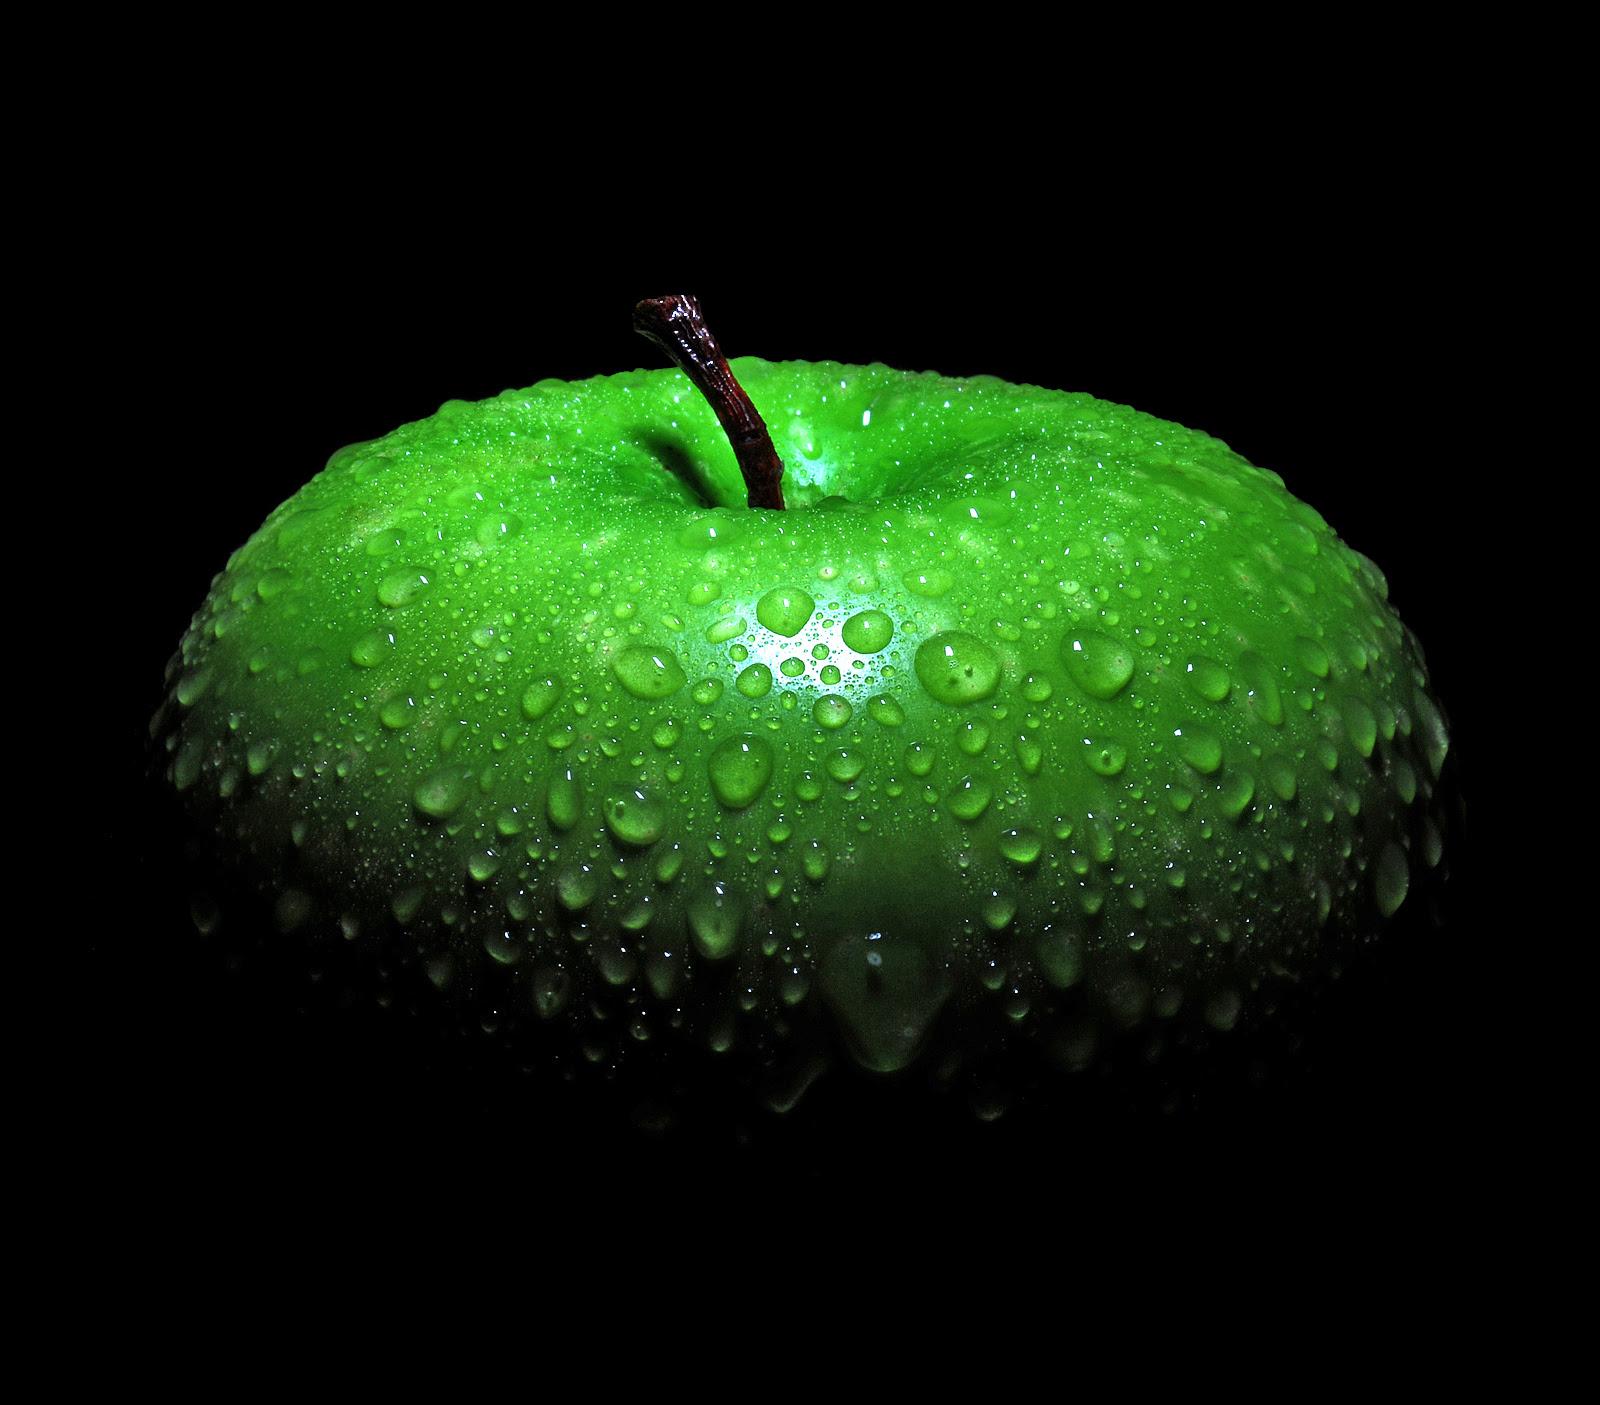 green apples black background HD Wallpaper